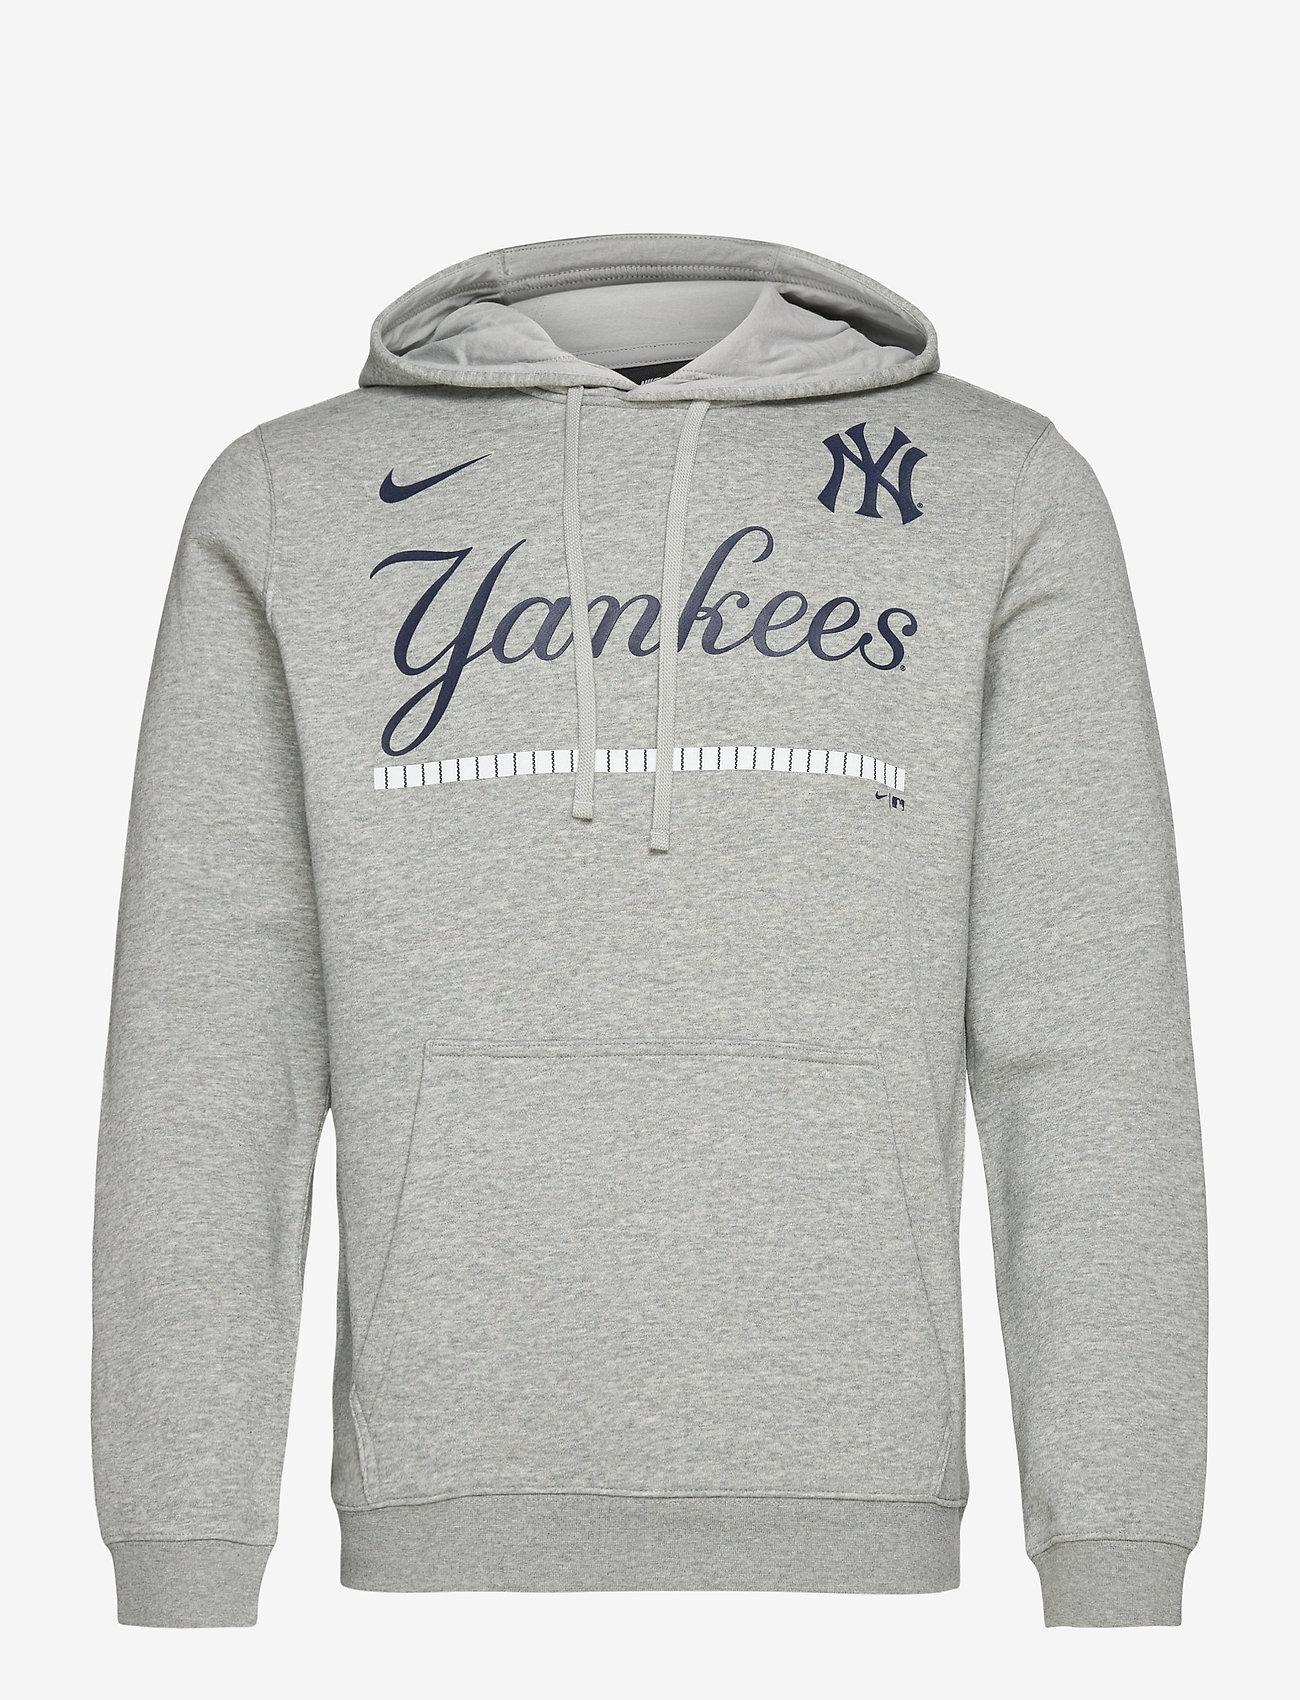 Leve intimidad Compulsión  New York Yankees Nike Color Bar Club Pullover Hoodie (Dark Grey Heather)  (69.90 €) - NIKE Fan Gear - | Boozt.com